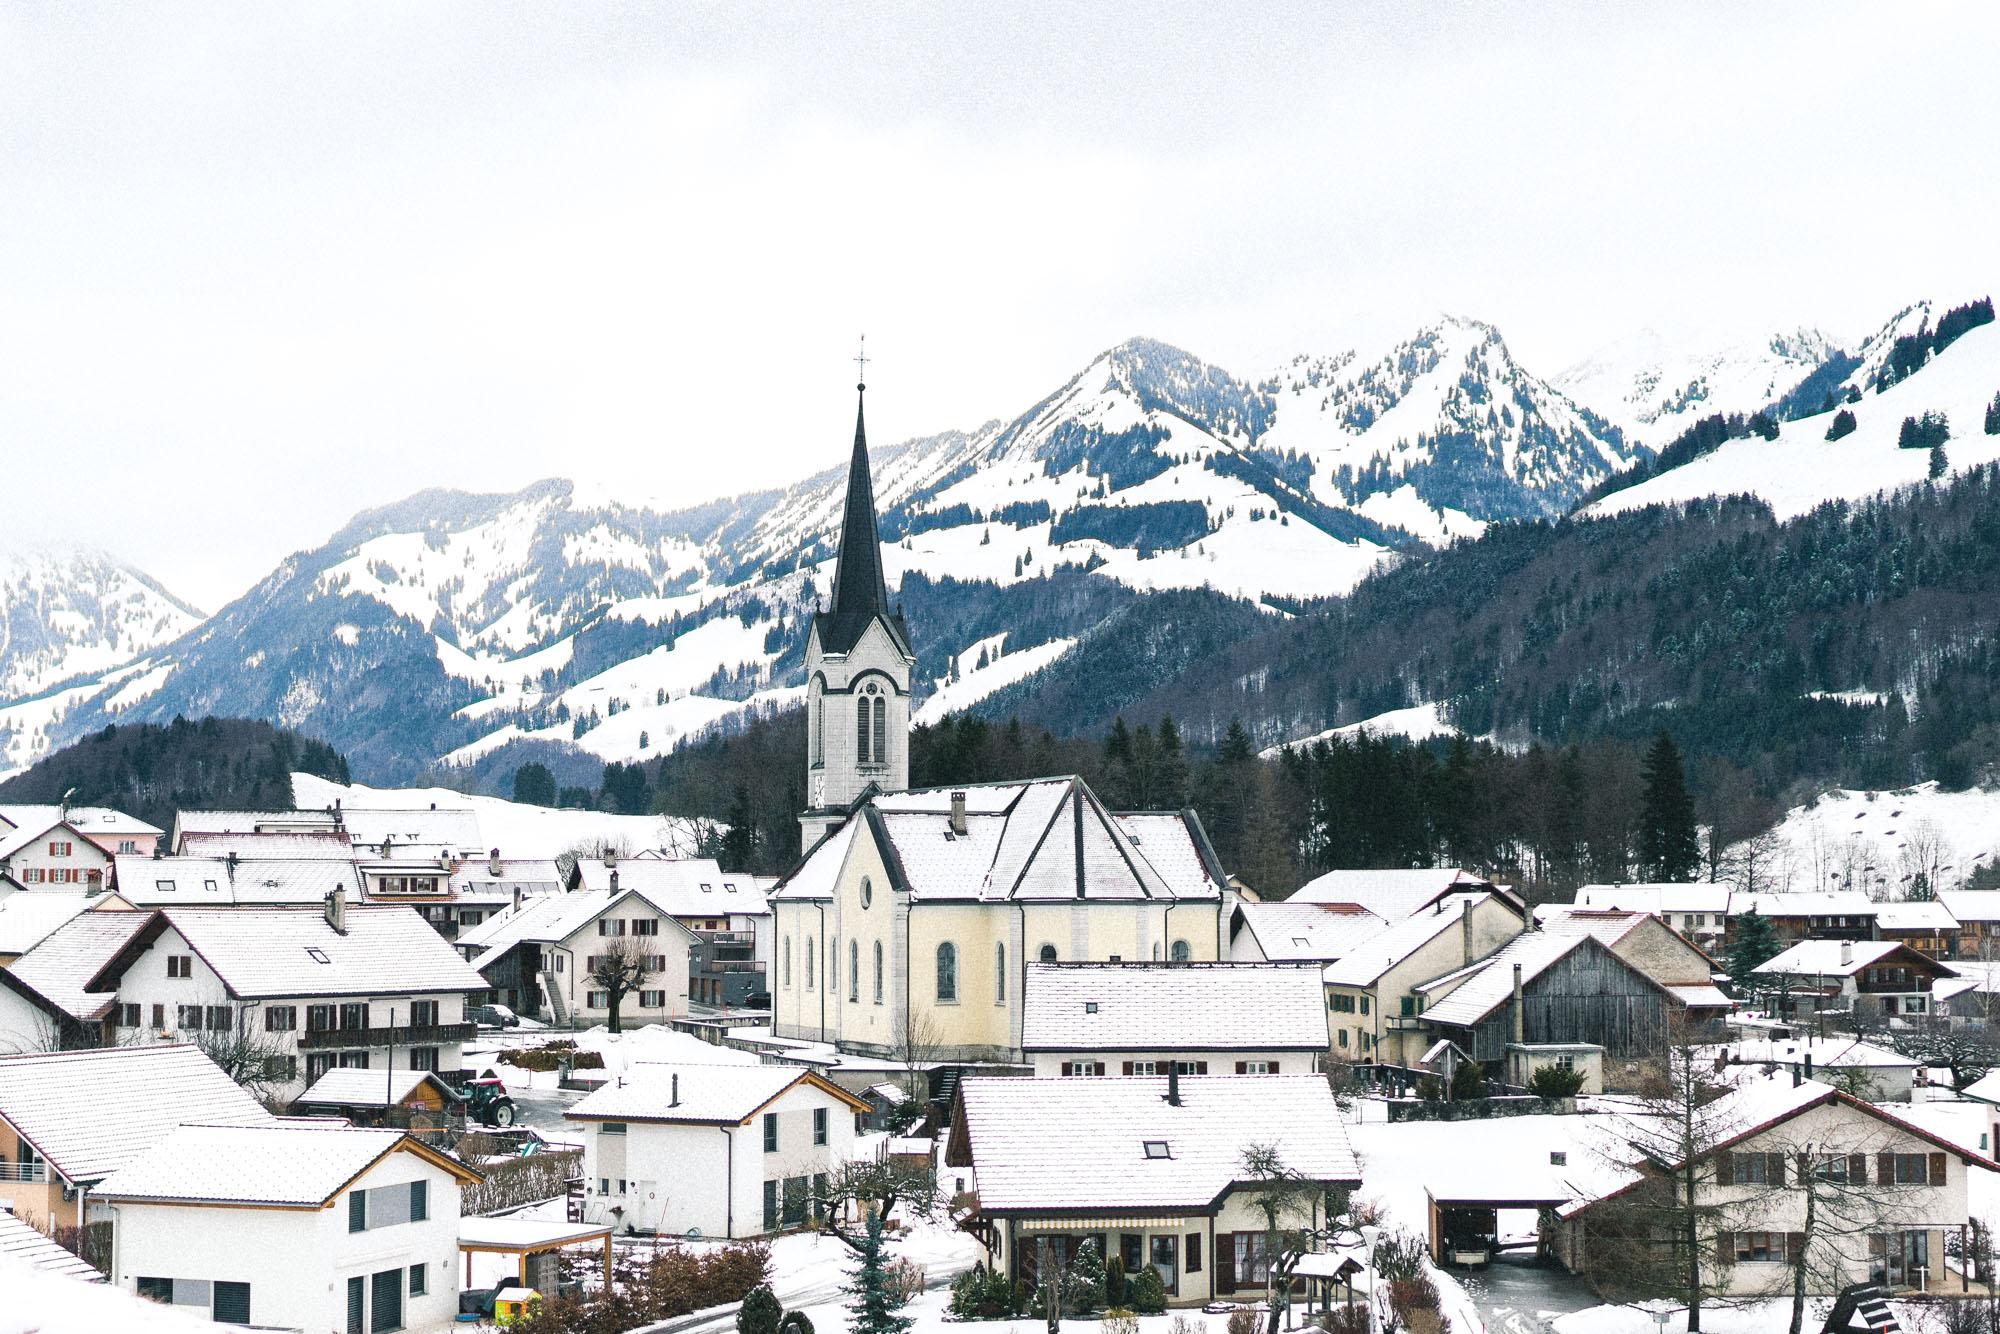 Downtown Gstaad, Switzerland, A Luxury Ski Town in Winter